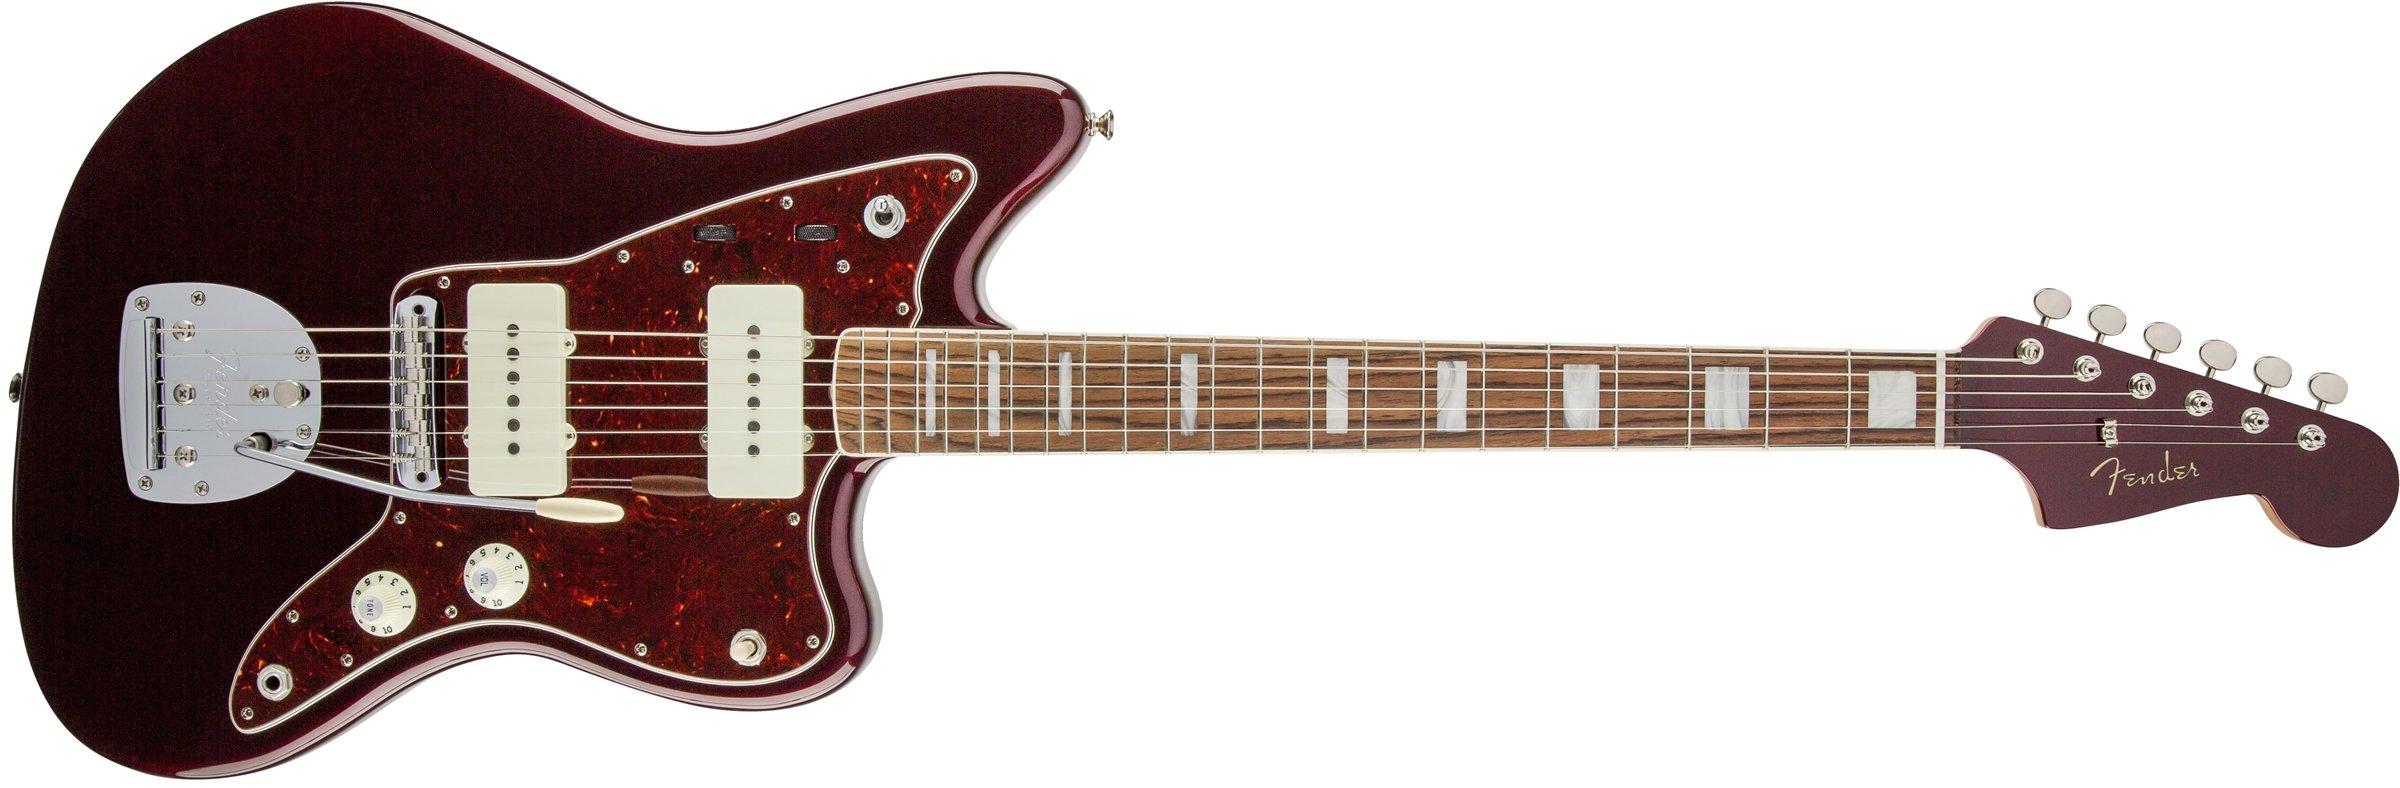 Cheap Fender Troy Van Leeuwen Jazzmaster Oxblood Solid-Body Electric Guitar Black Friday & Cyber Monday 2019